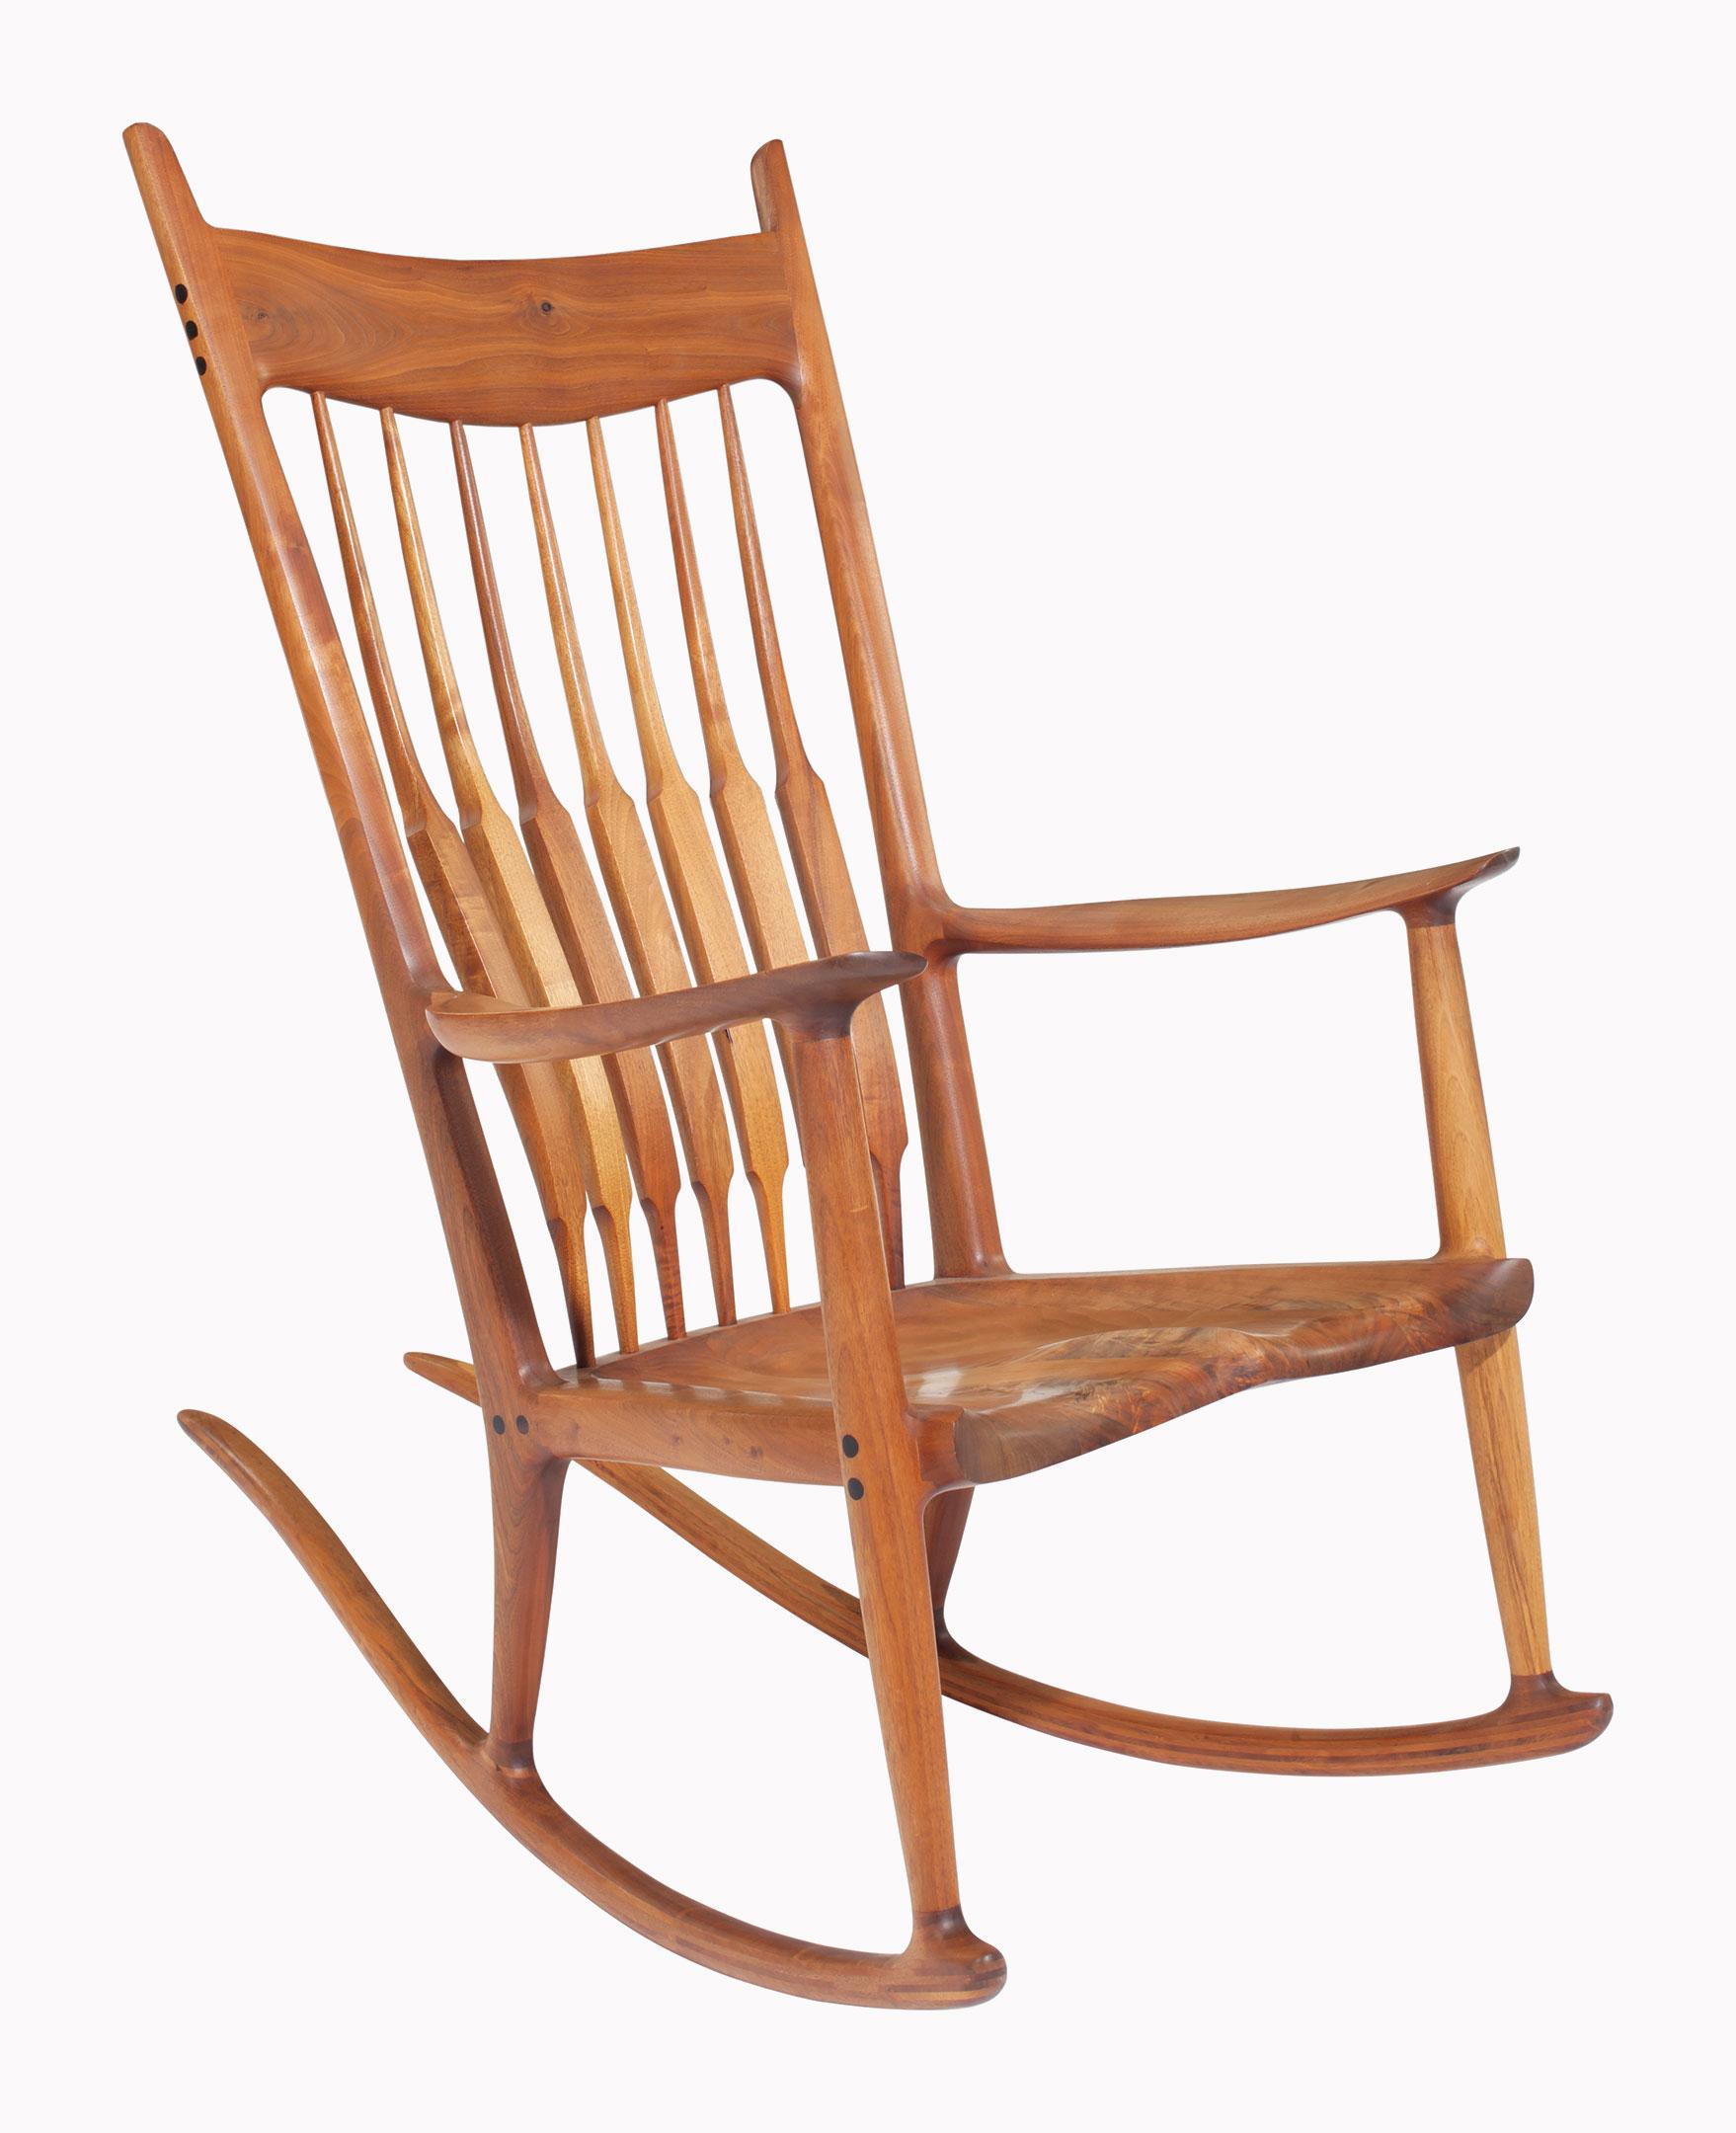 Attractive Sam Maloof (1916 2009), A Rocking Chair, 1980. Walnut,